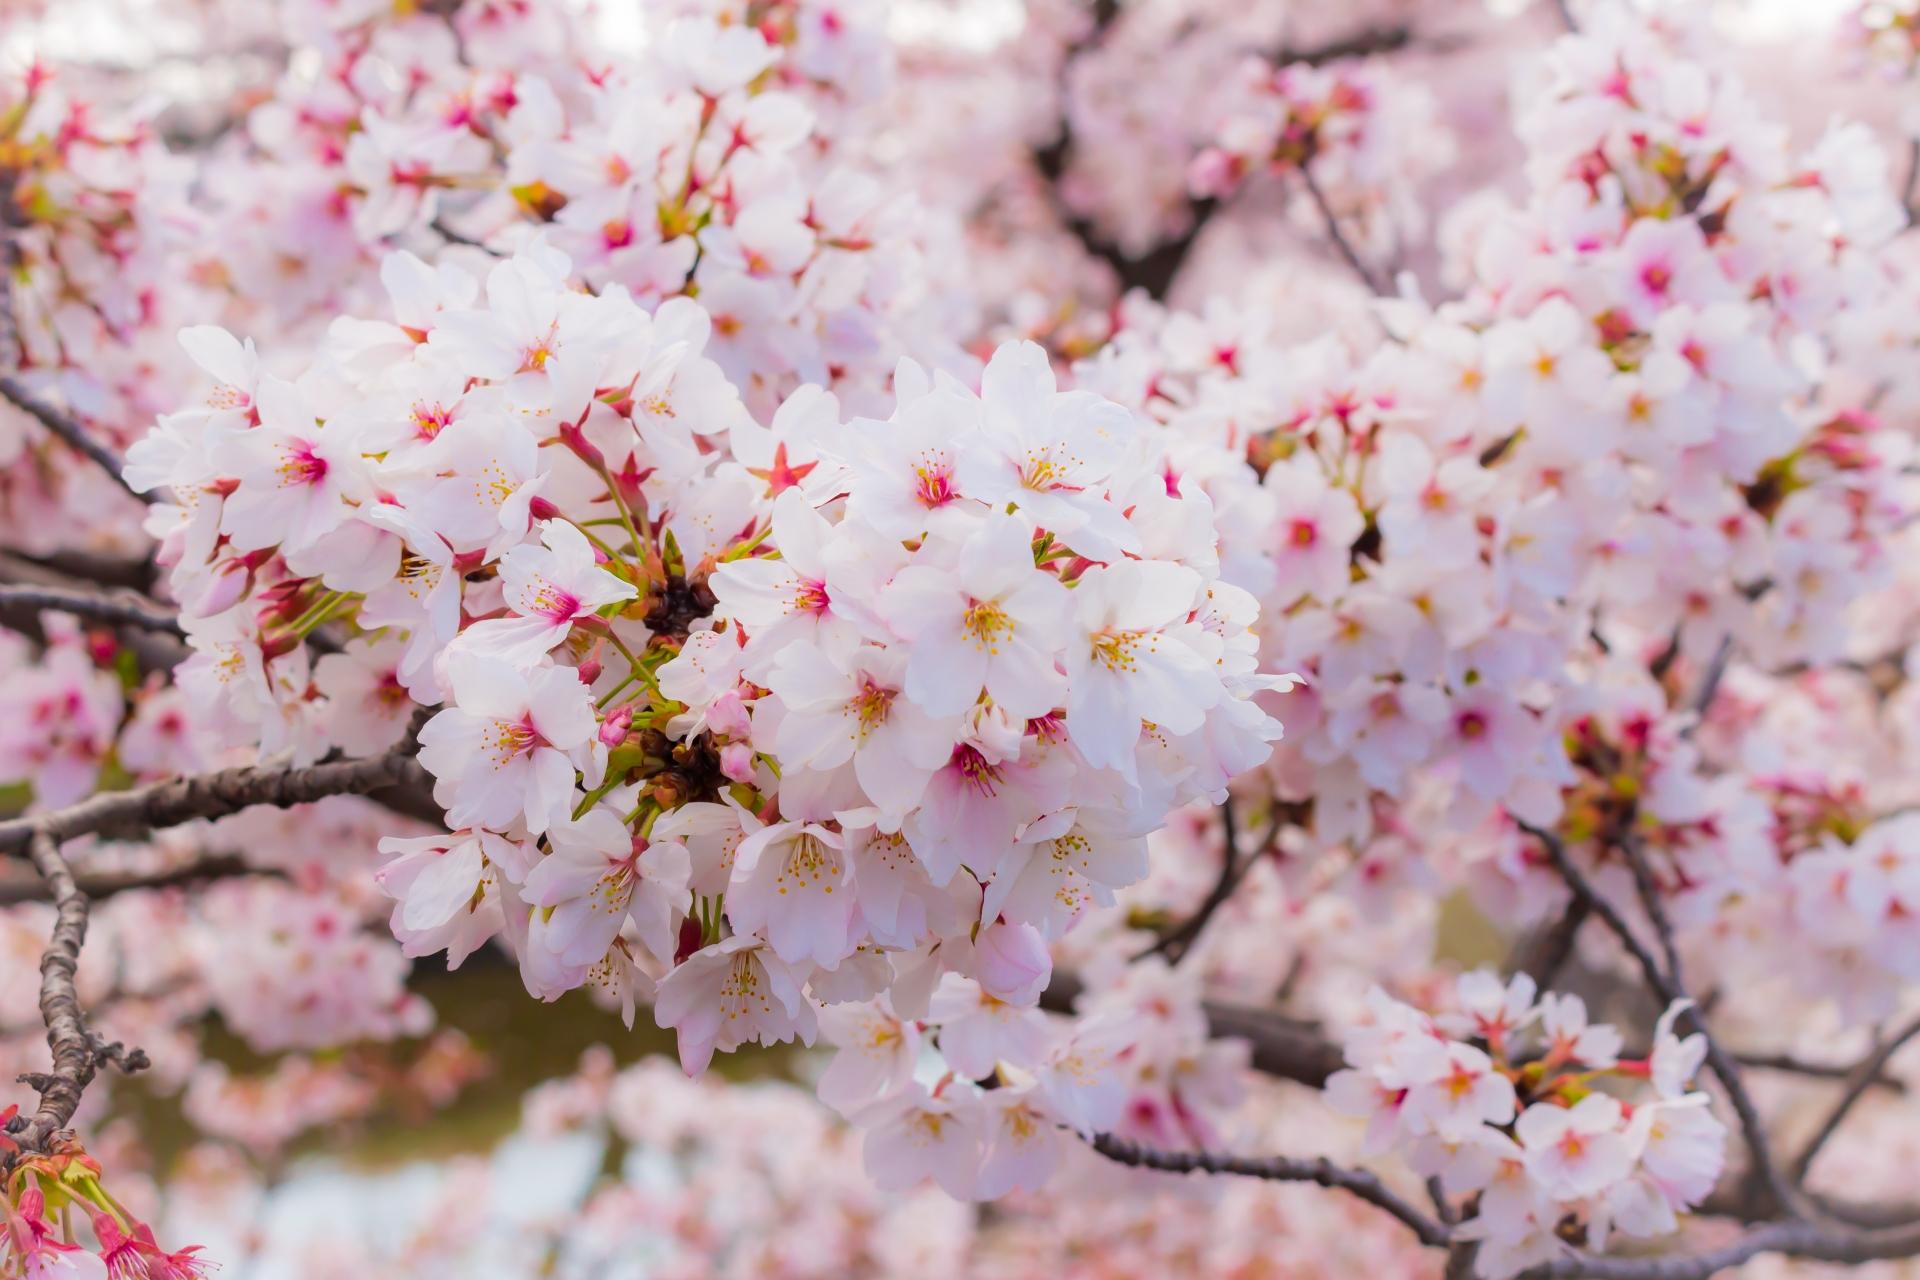 2419406_m 奈良県  高田千本桜(桜並木が美しい近鉄沿線で人気の桜スポット! 写真の紹介、アクセス情報や駐車場情報など)